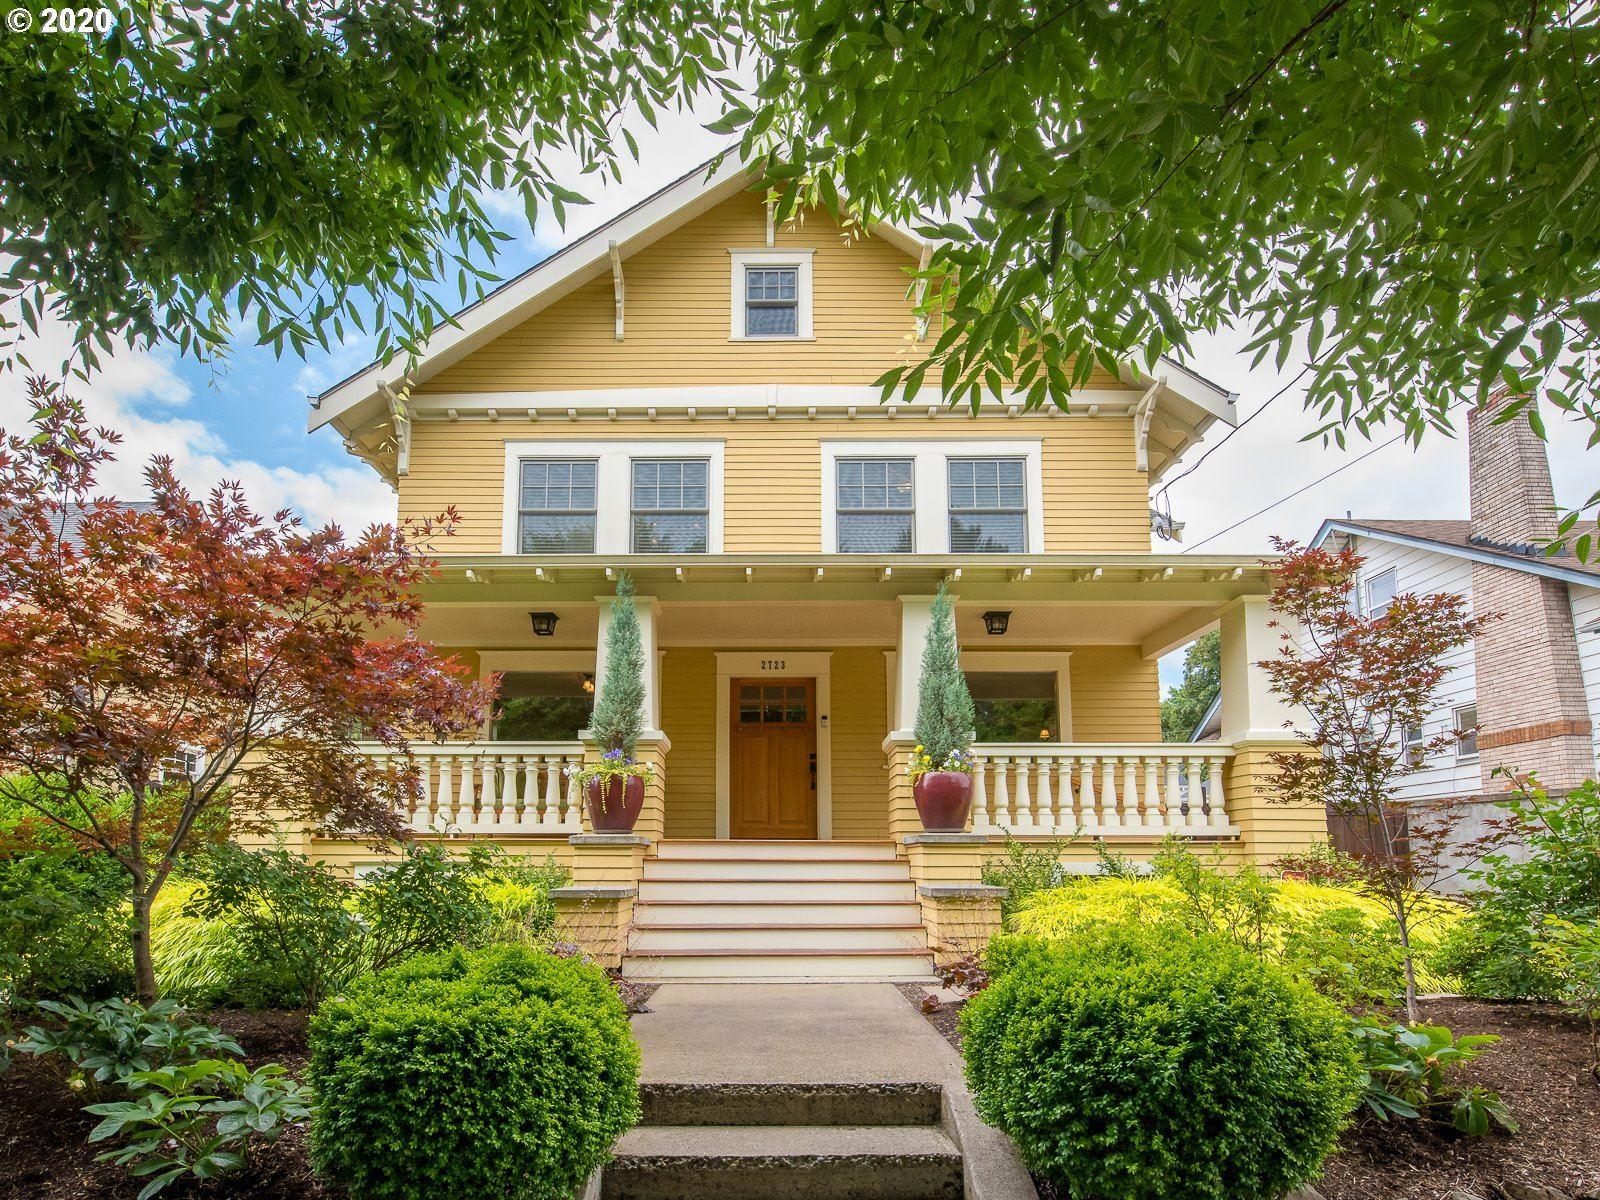 2723 NE 9TH AVE, Portland, OR 97212 - MLS#: 20046177